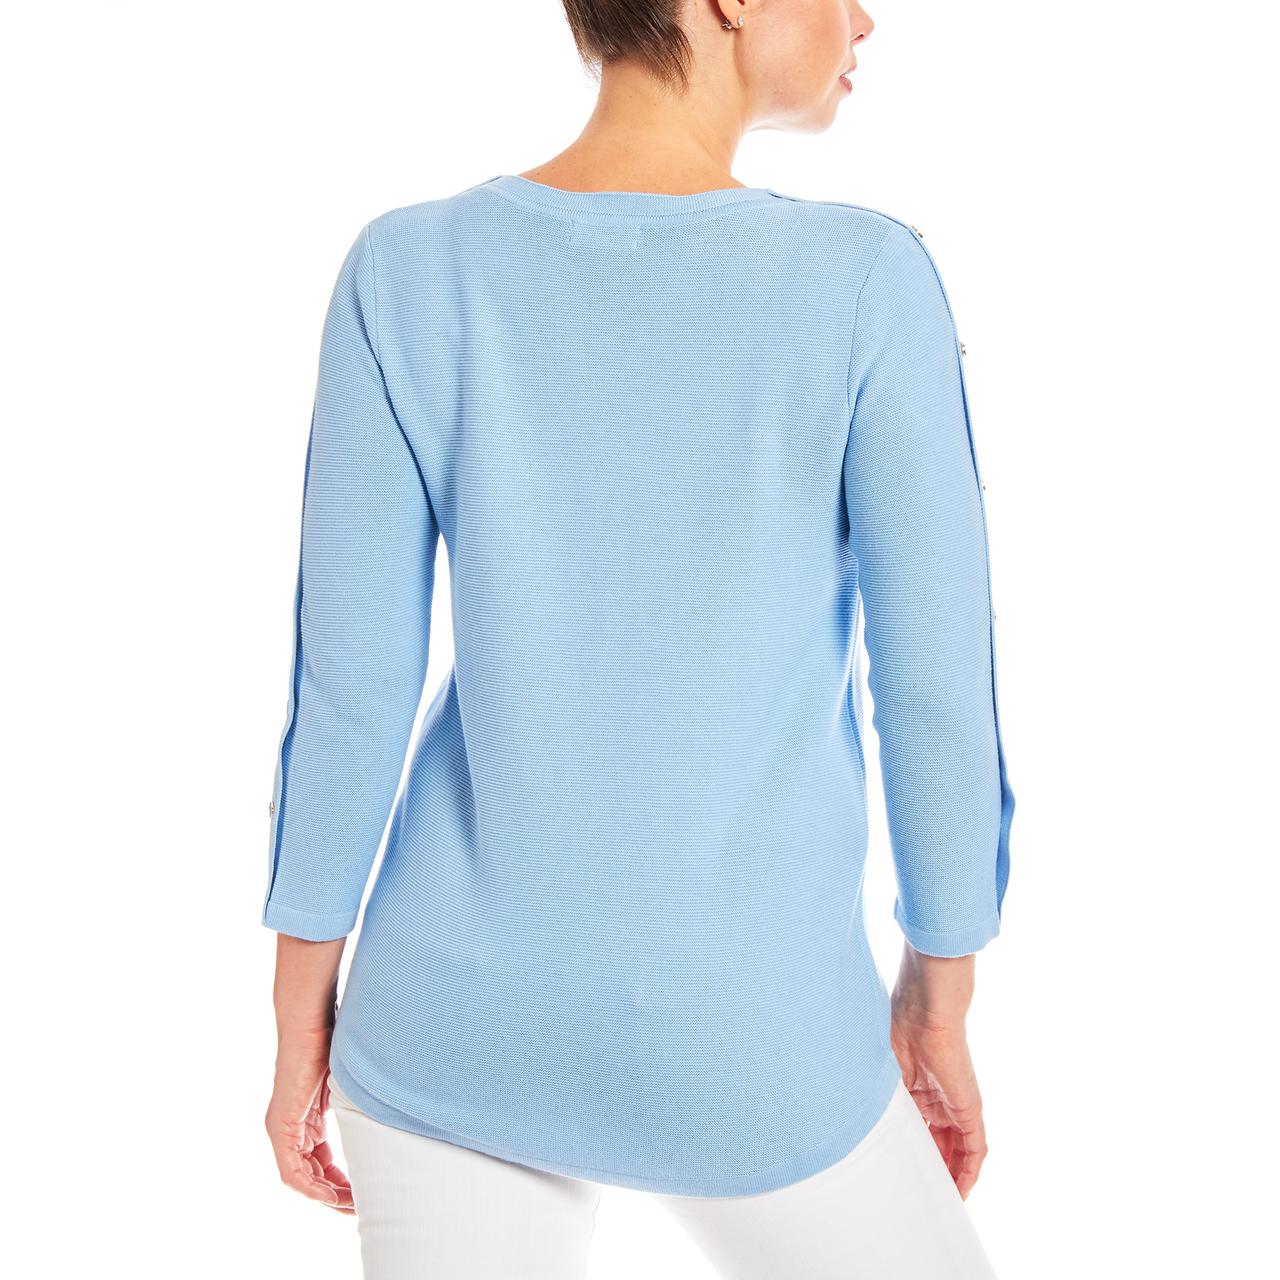 3/4 Sleeve Novelty Button Sleeve Crew Neck Textured Sweater in Light Blue